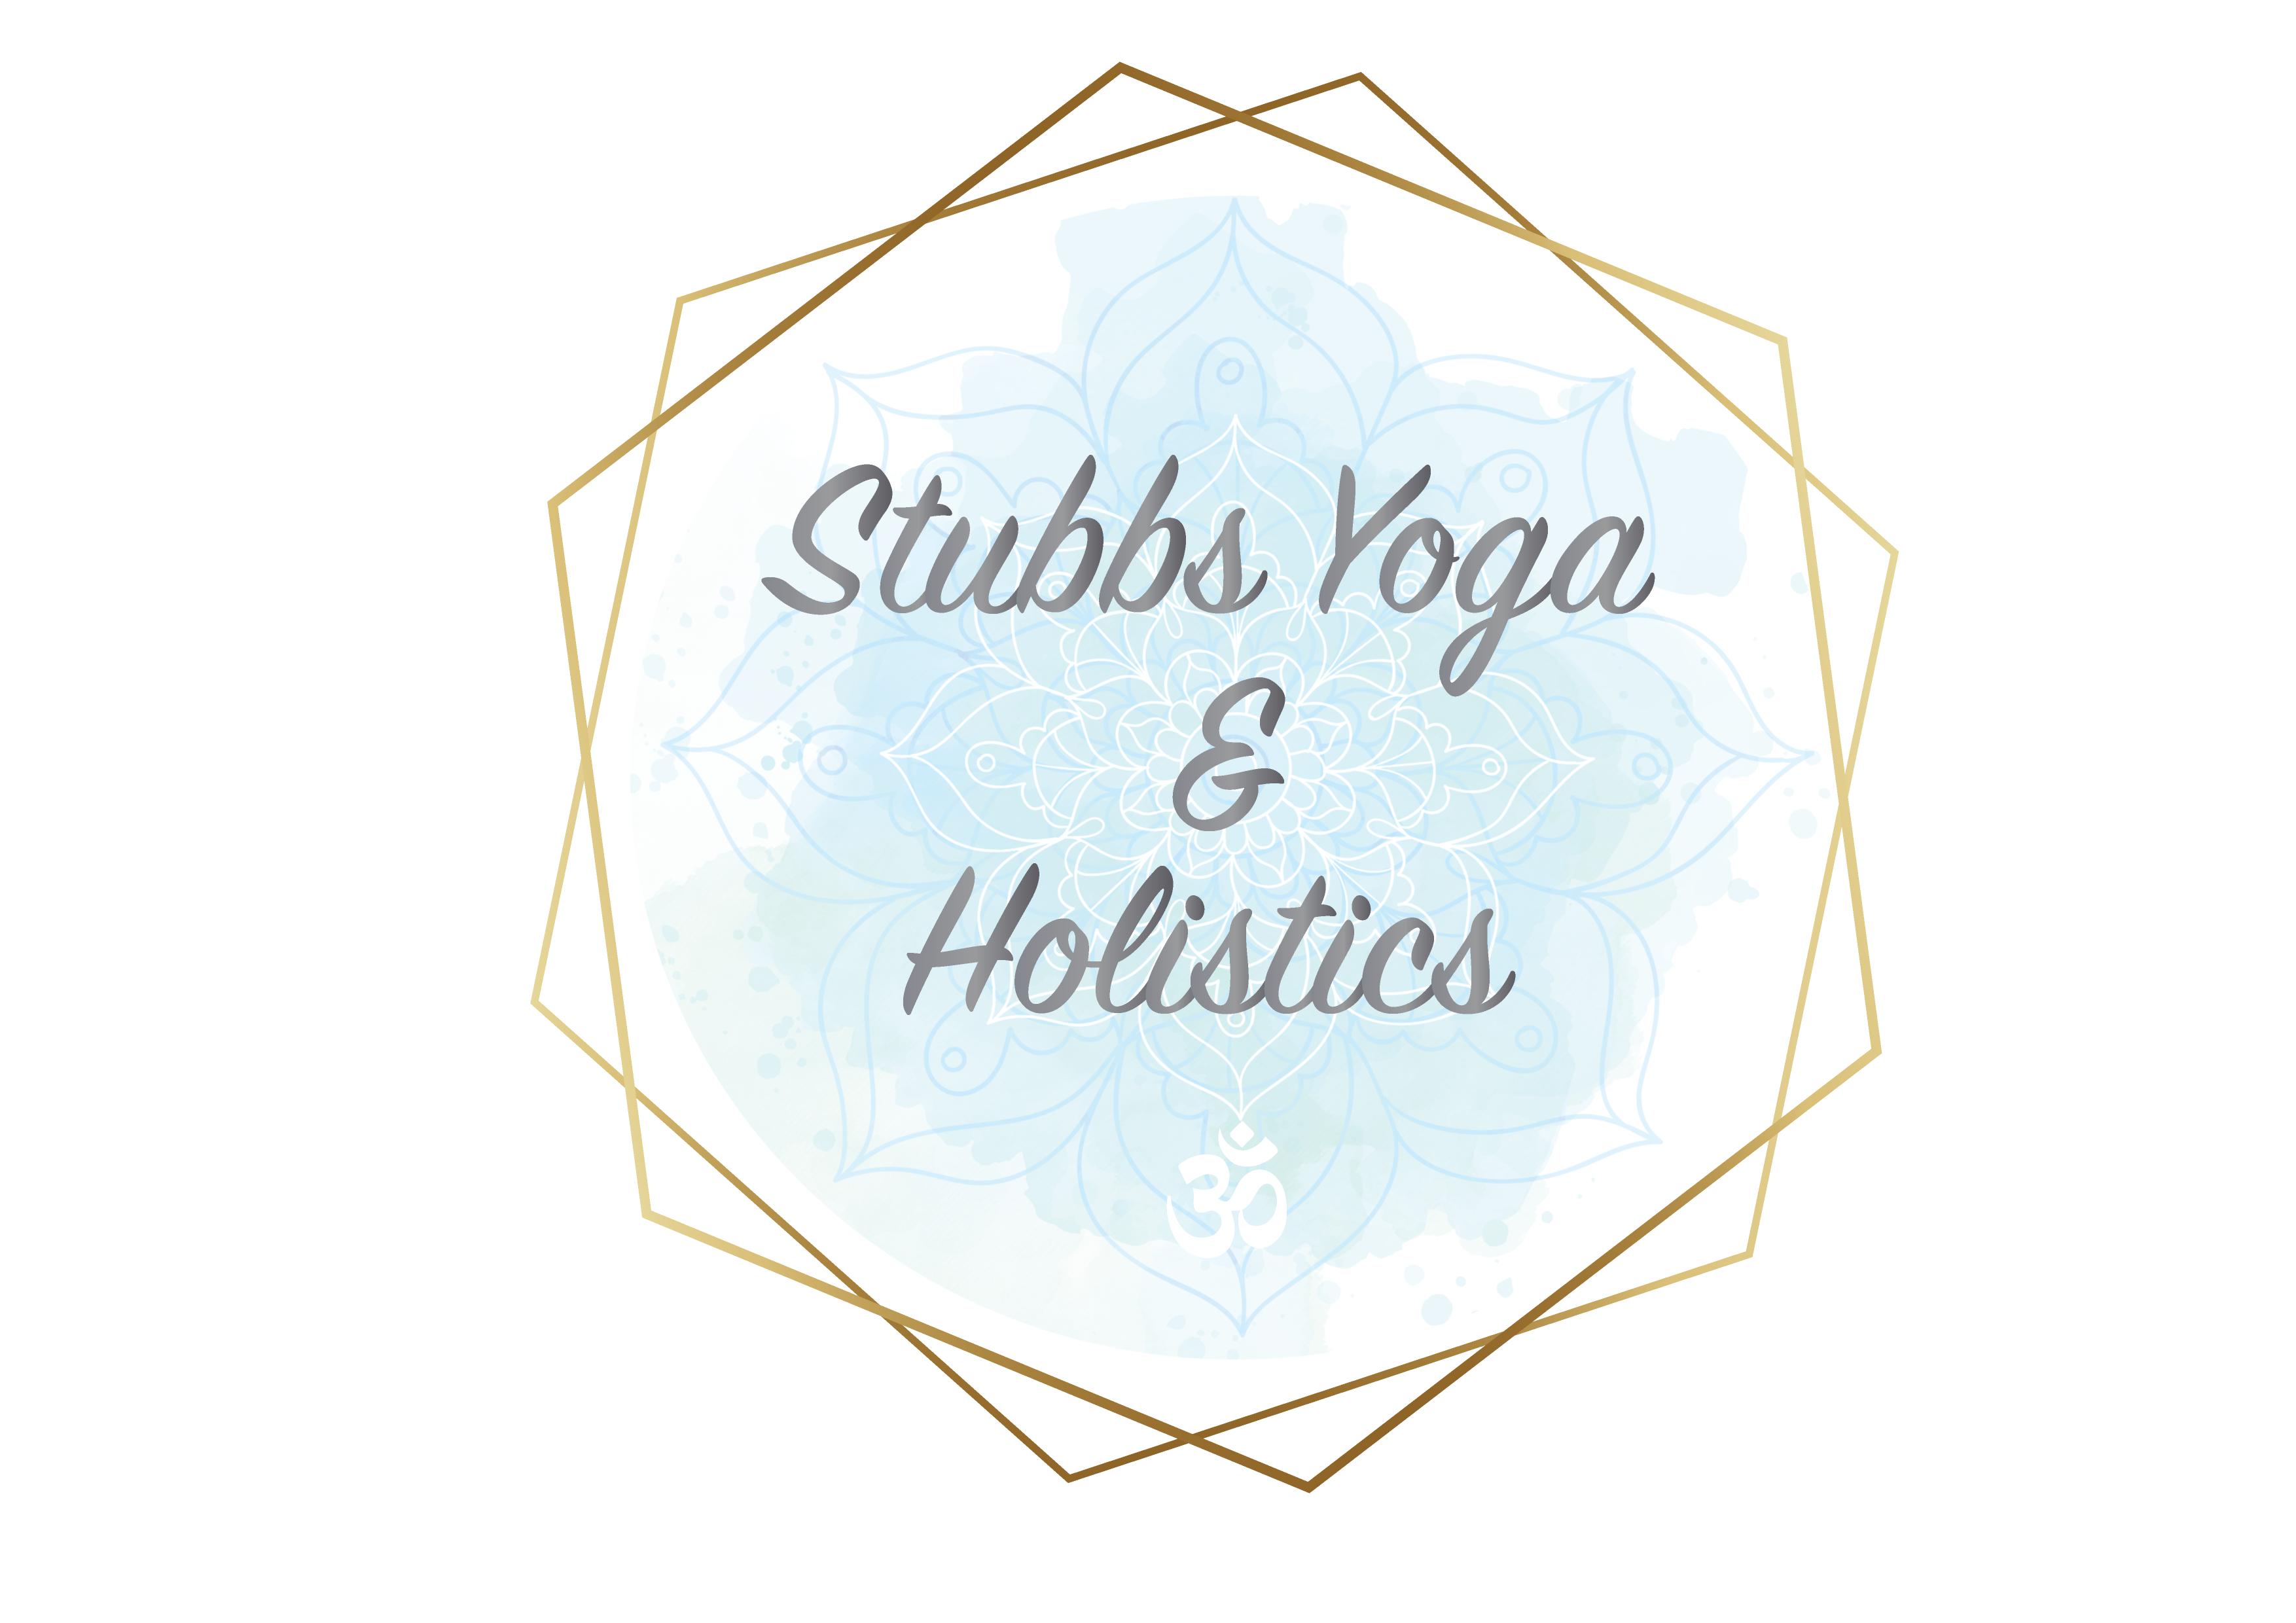 STUBBS YOGA & HOLISTICS